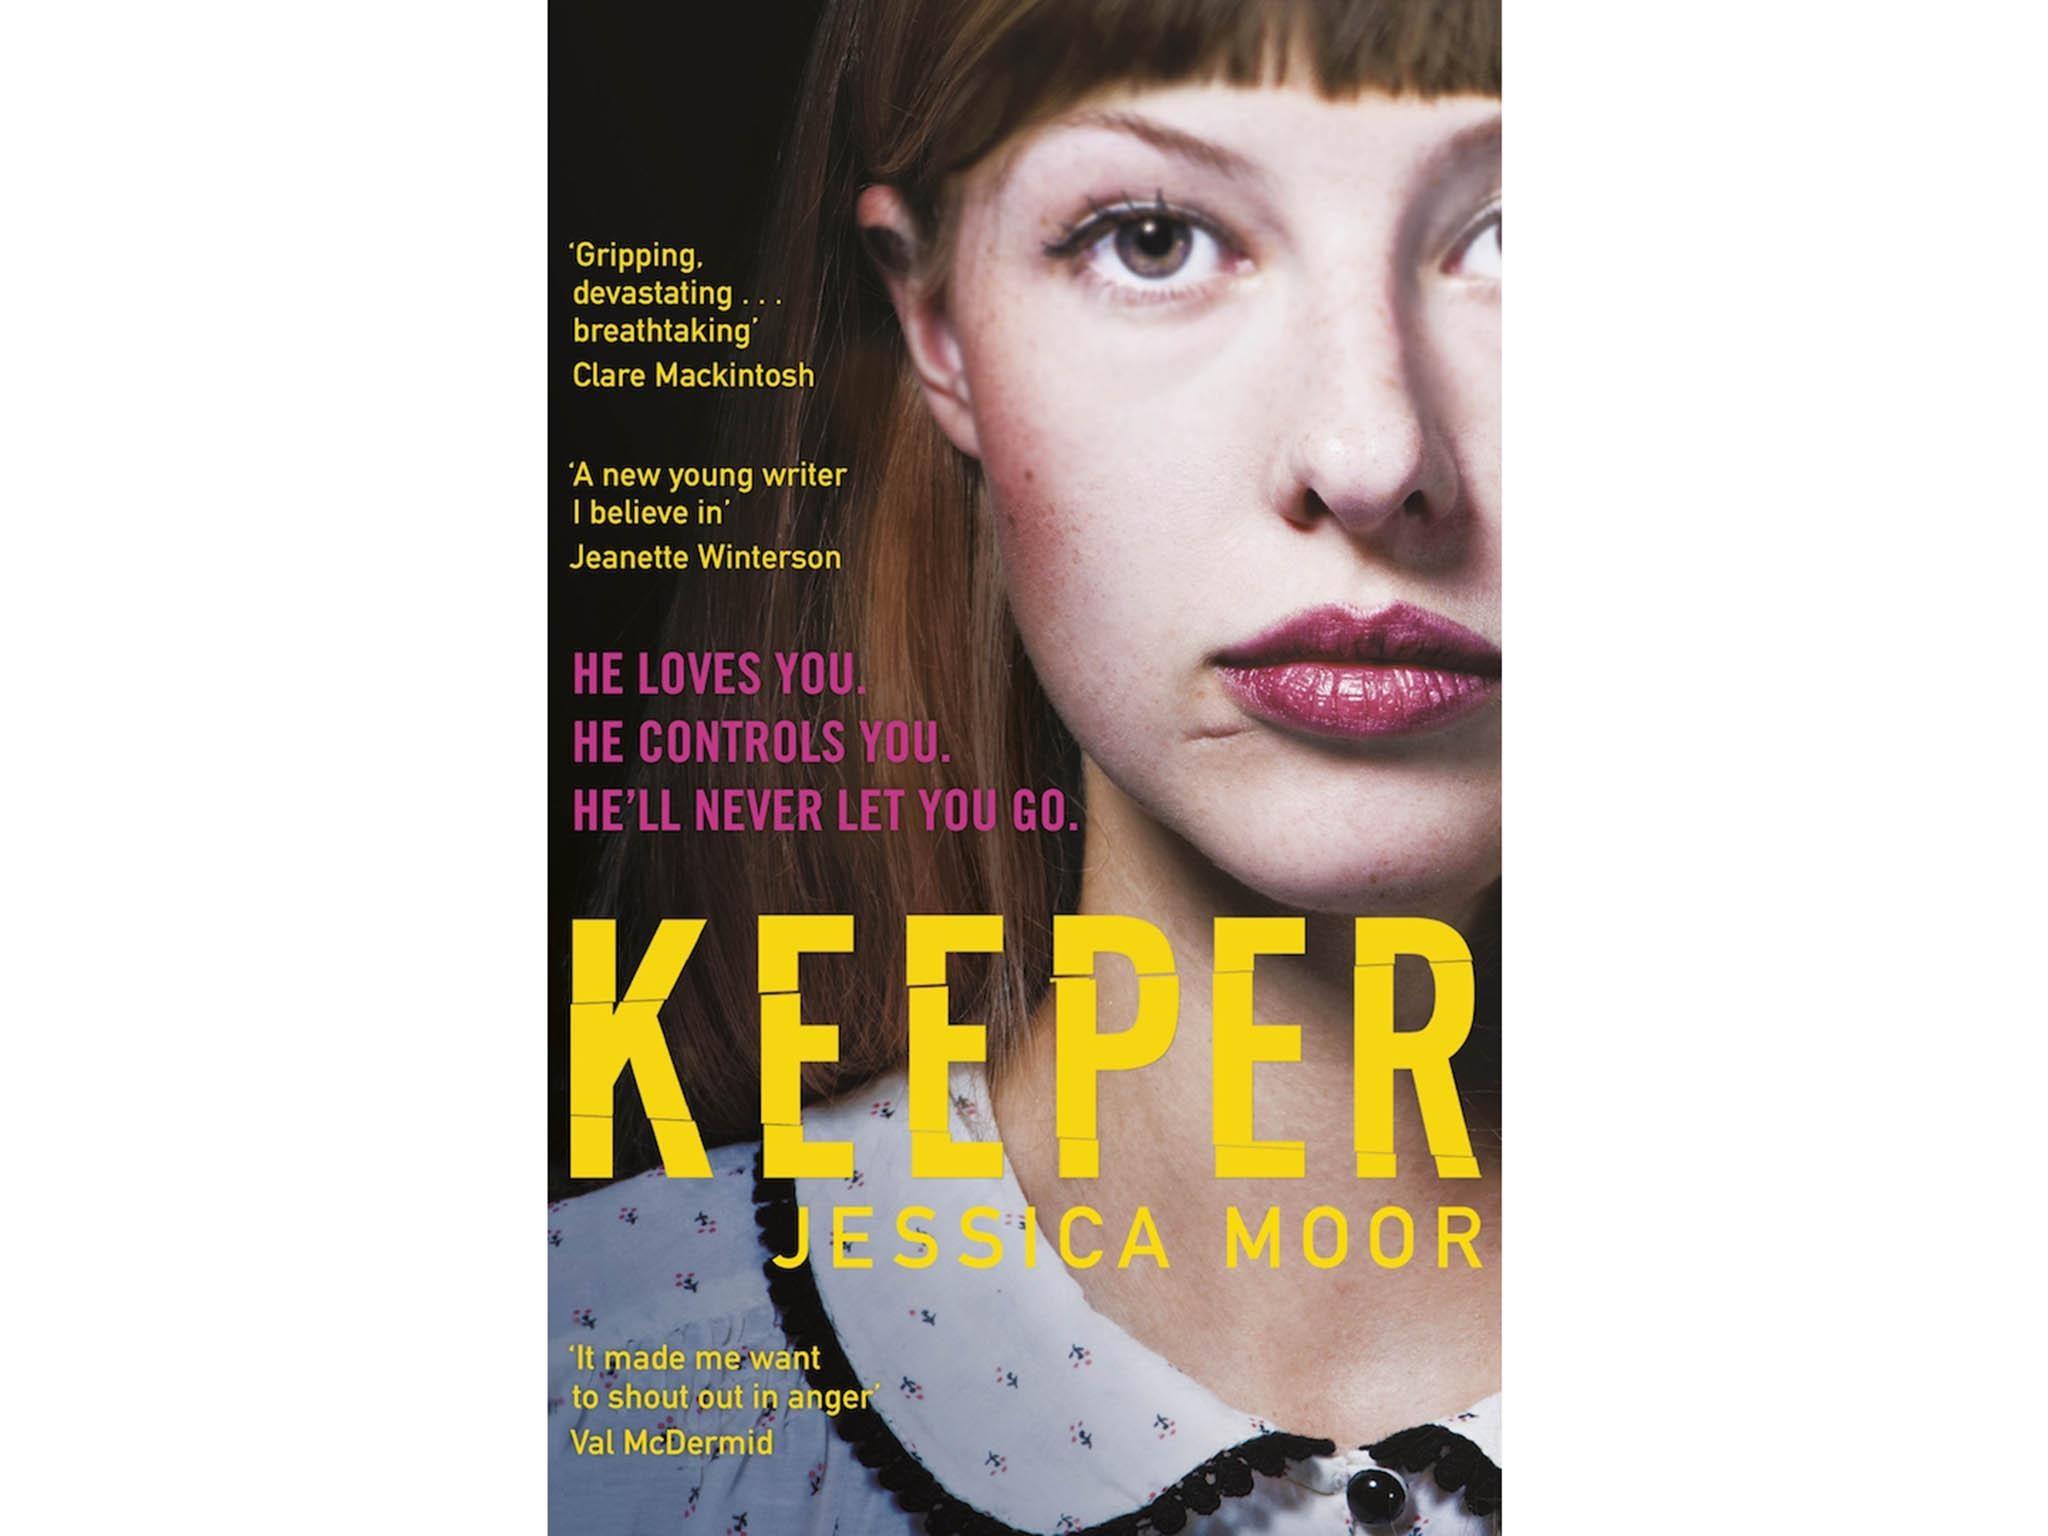 """ كيپر"" (حافظ) لجيسيكا مور، عن دار ڤايكينغ للنشر"